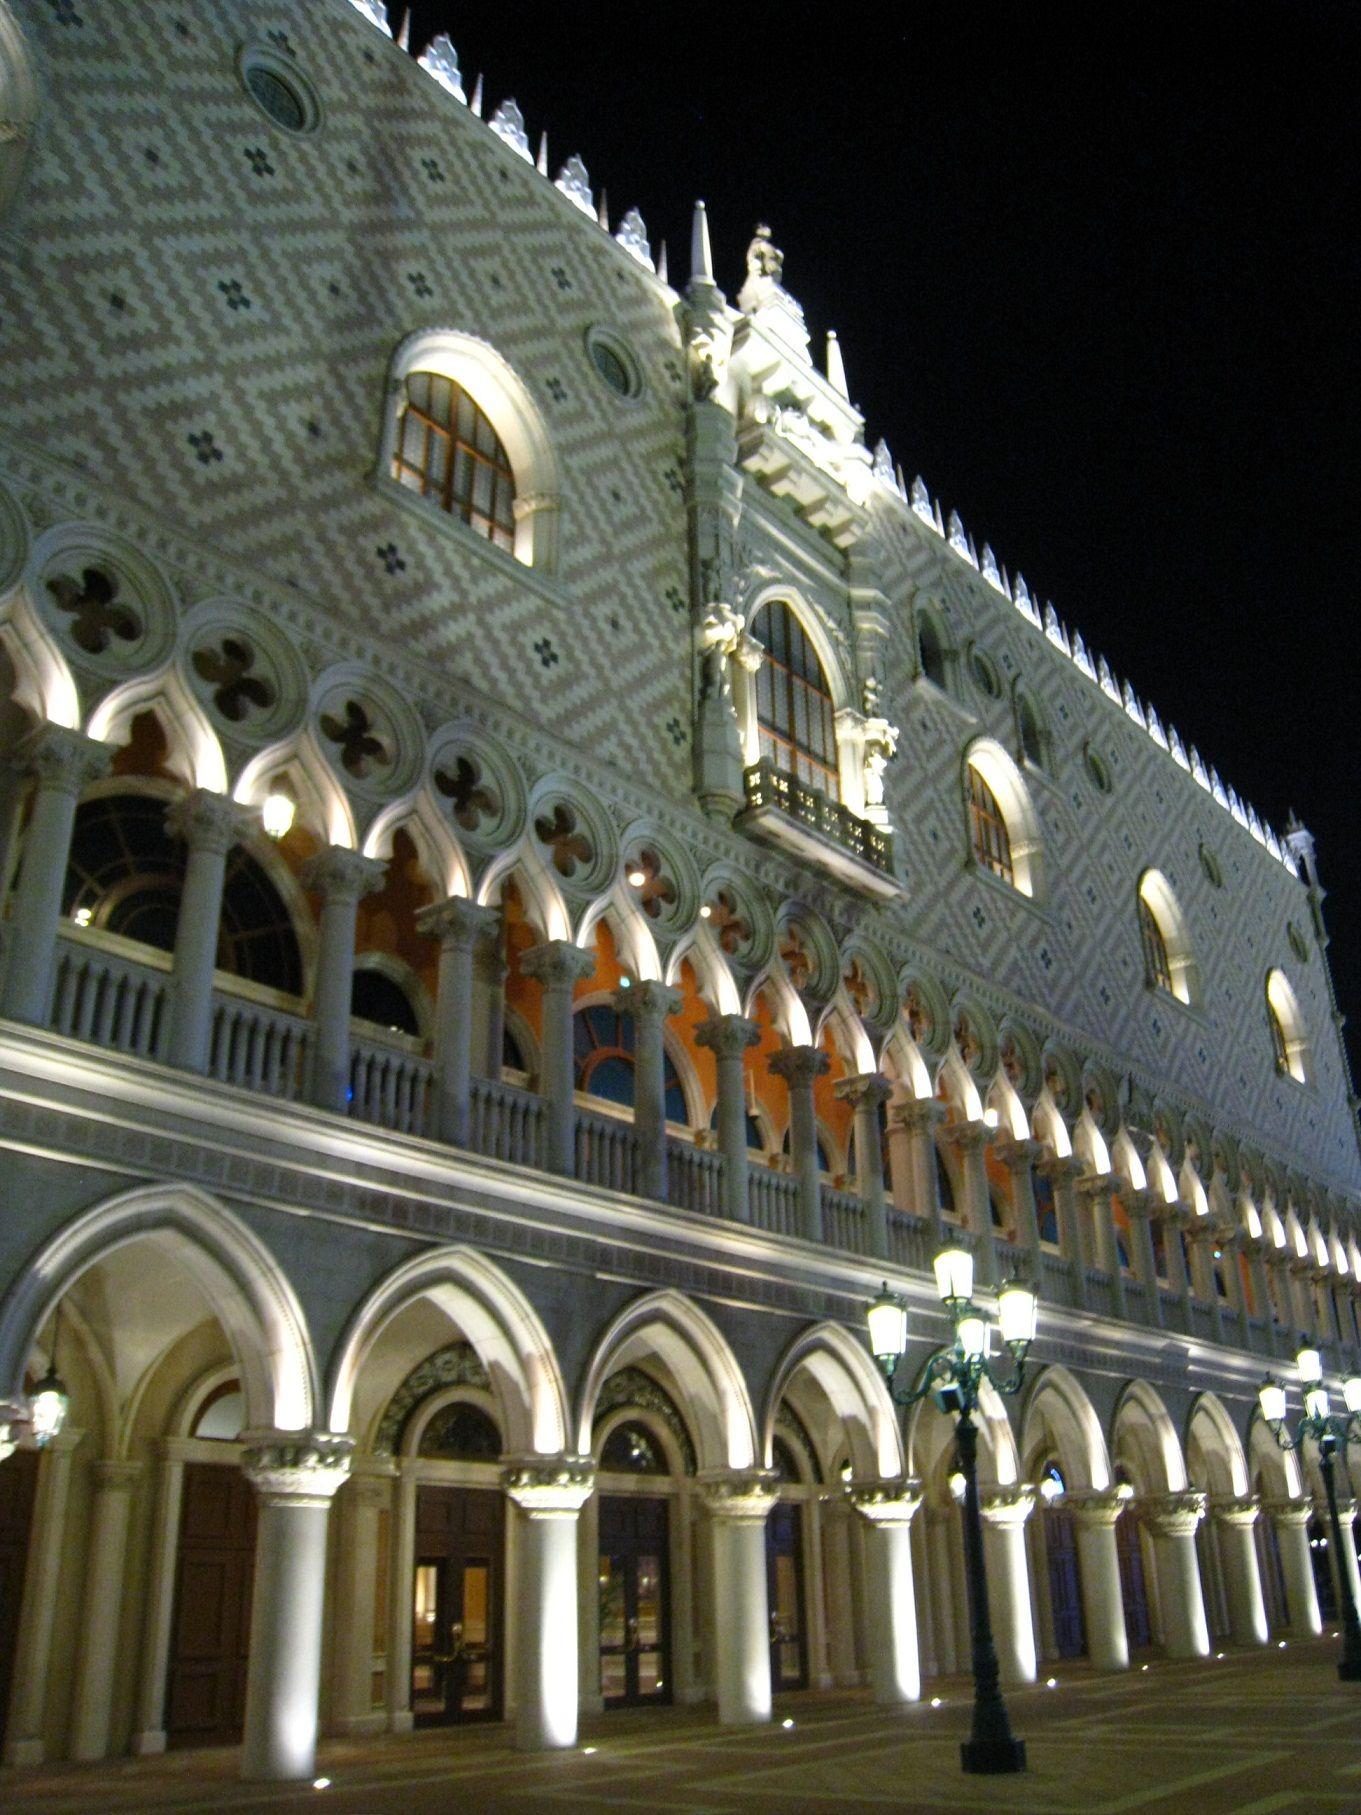 Italy? - Macau